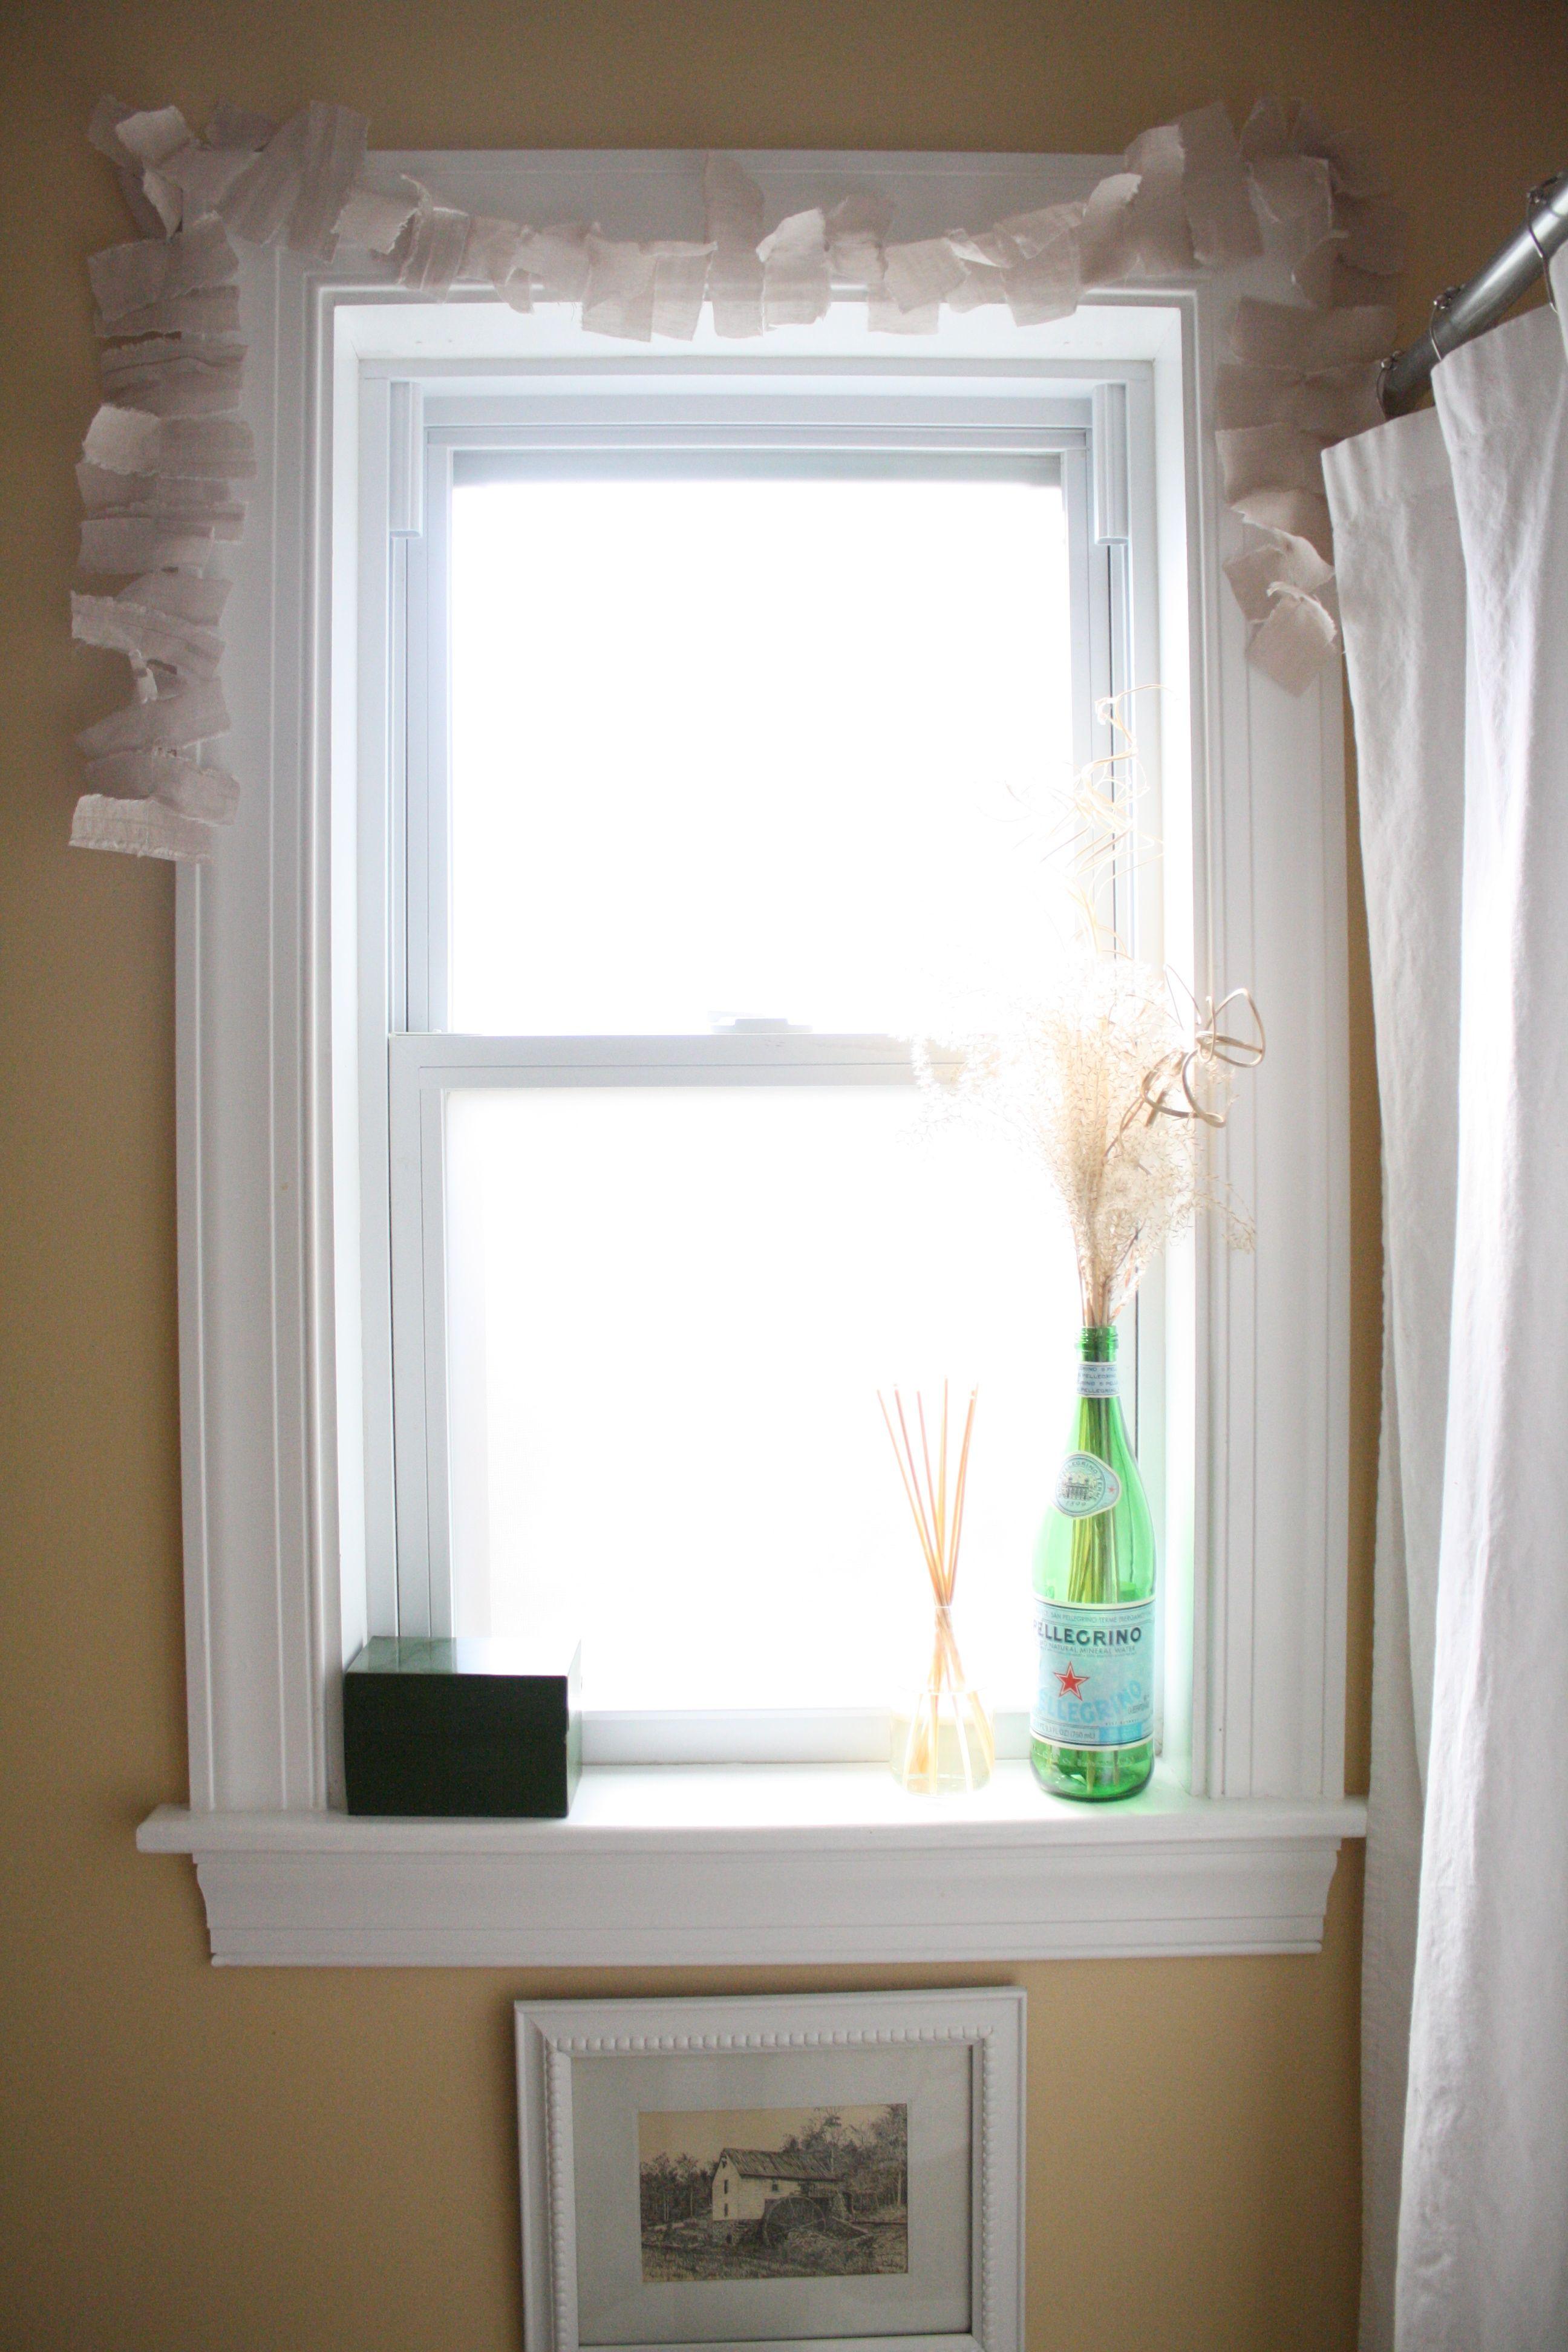 Bathroom Themes Google Search Bedroom Decor Pinterest Bedrooms - How to frost a bathroom window for bathroom decor ideas